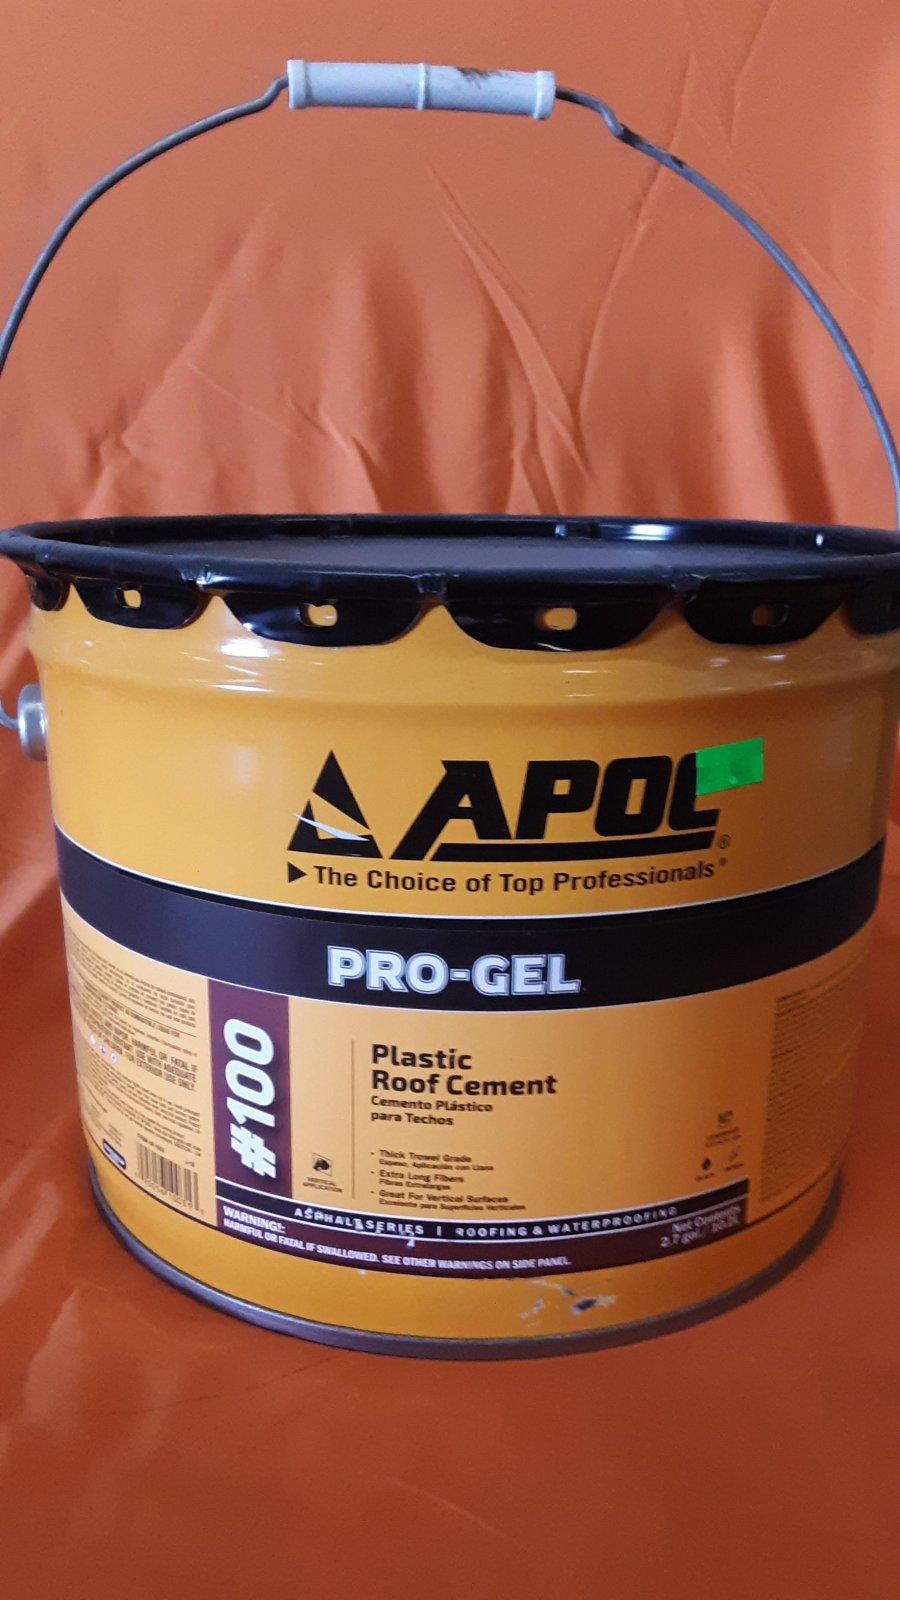 Plastic Roof Cement Black (Apoc 100) - 3 Gallon